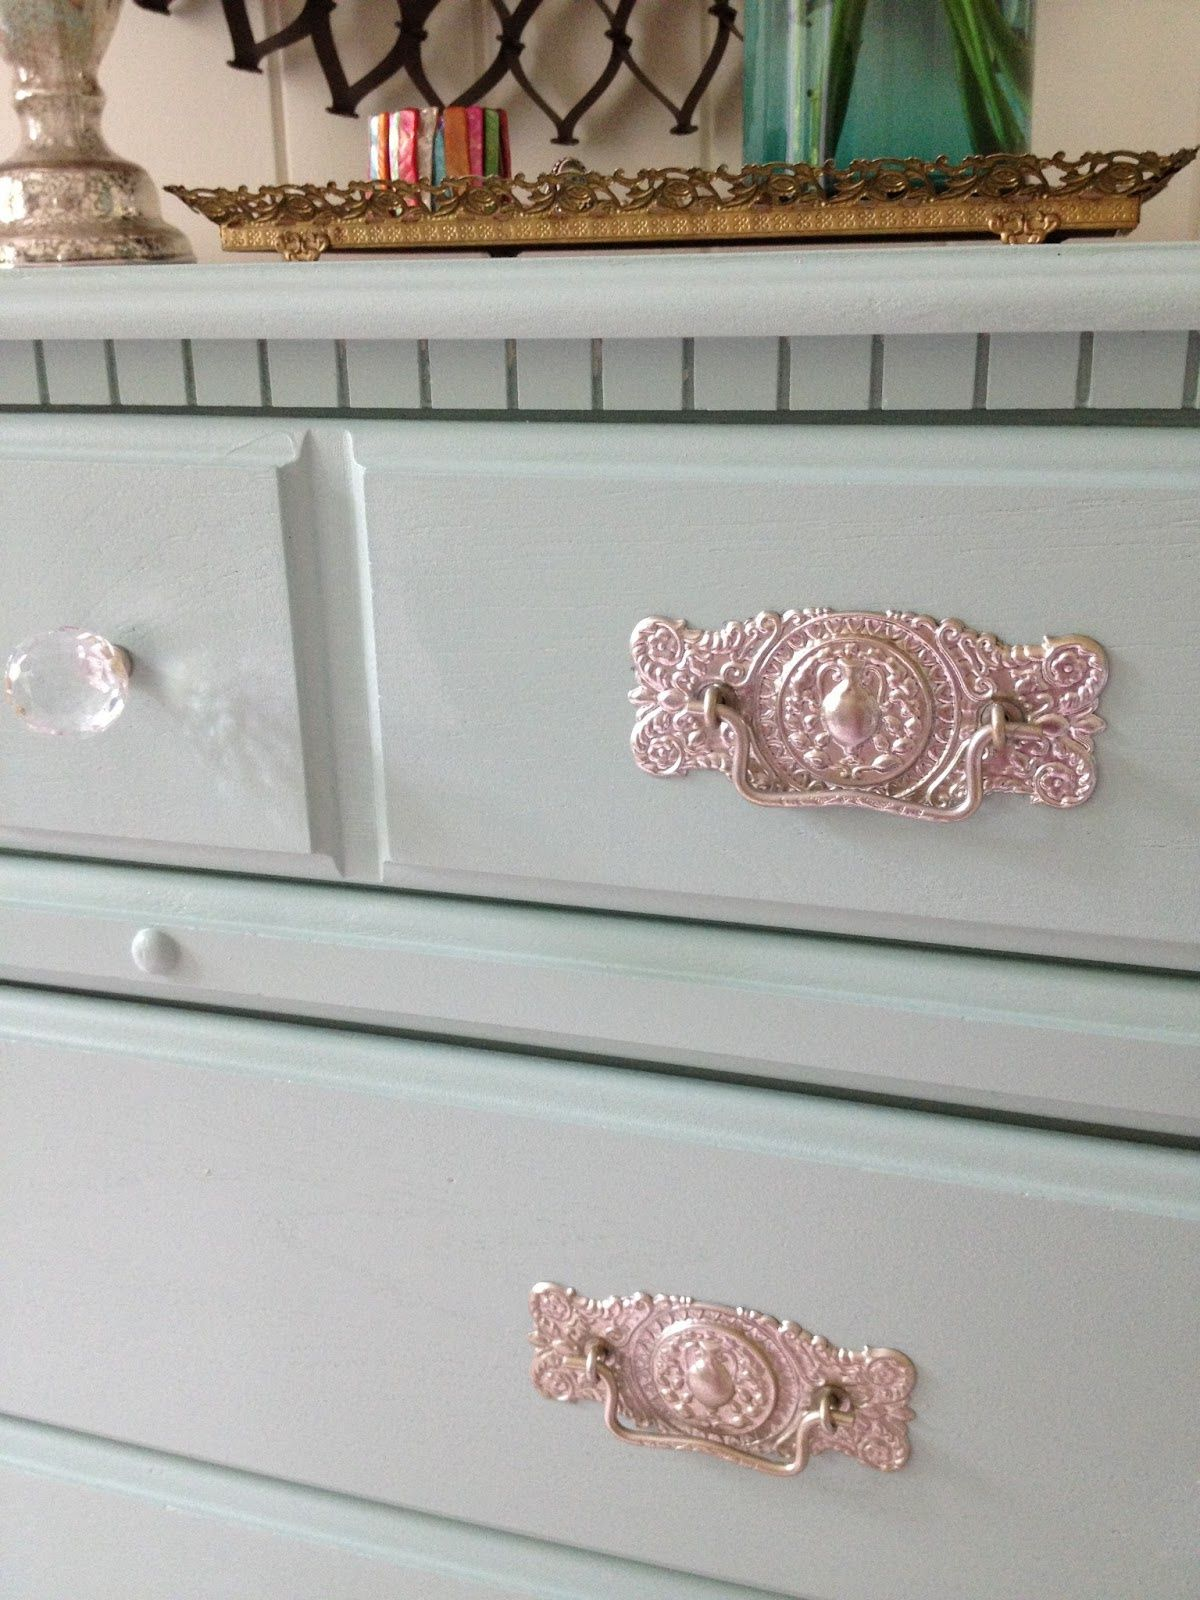 nc wood furniture paint. Primer Wood Furniture Paint Pu Pe Nc Uv Acrylic Grade N